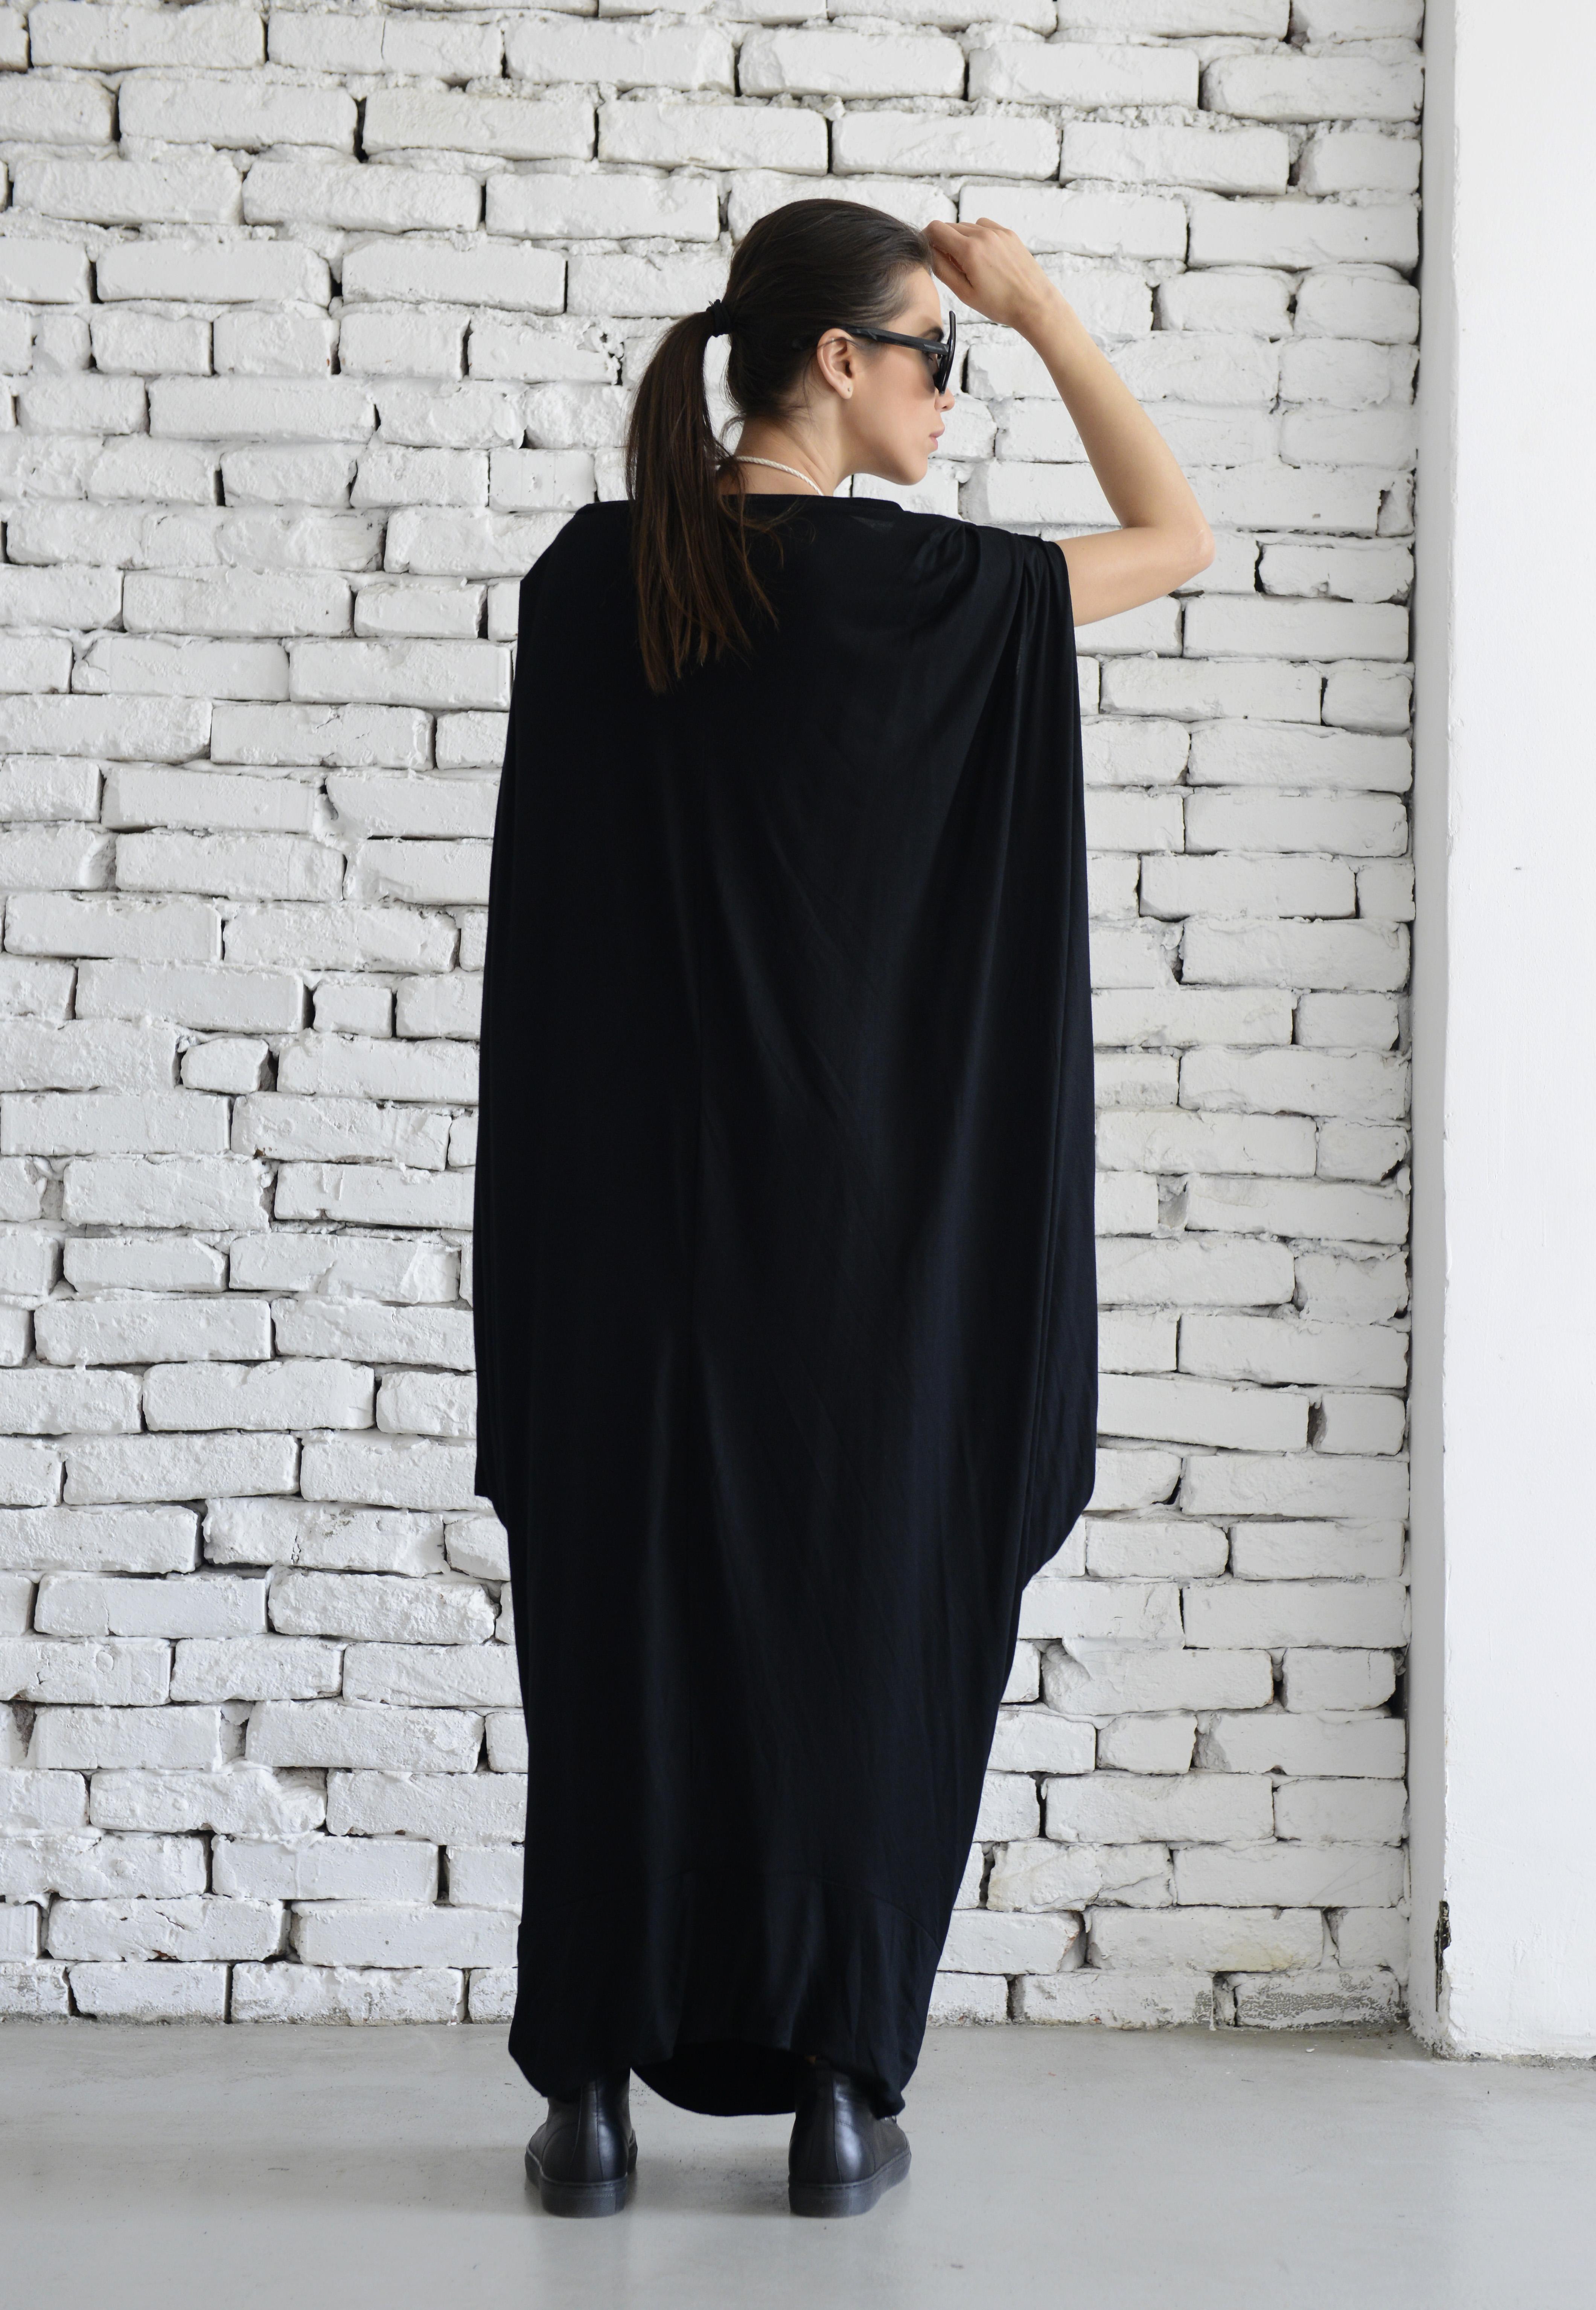 black_kaftan_maxi_dress_extravagant_kaftan_plus_size_black_long_dresses_2.jpg